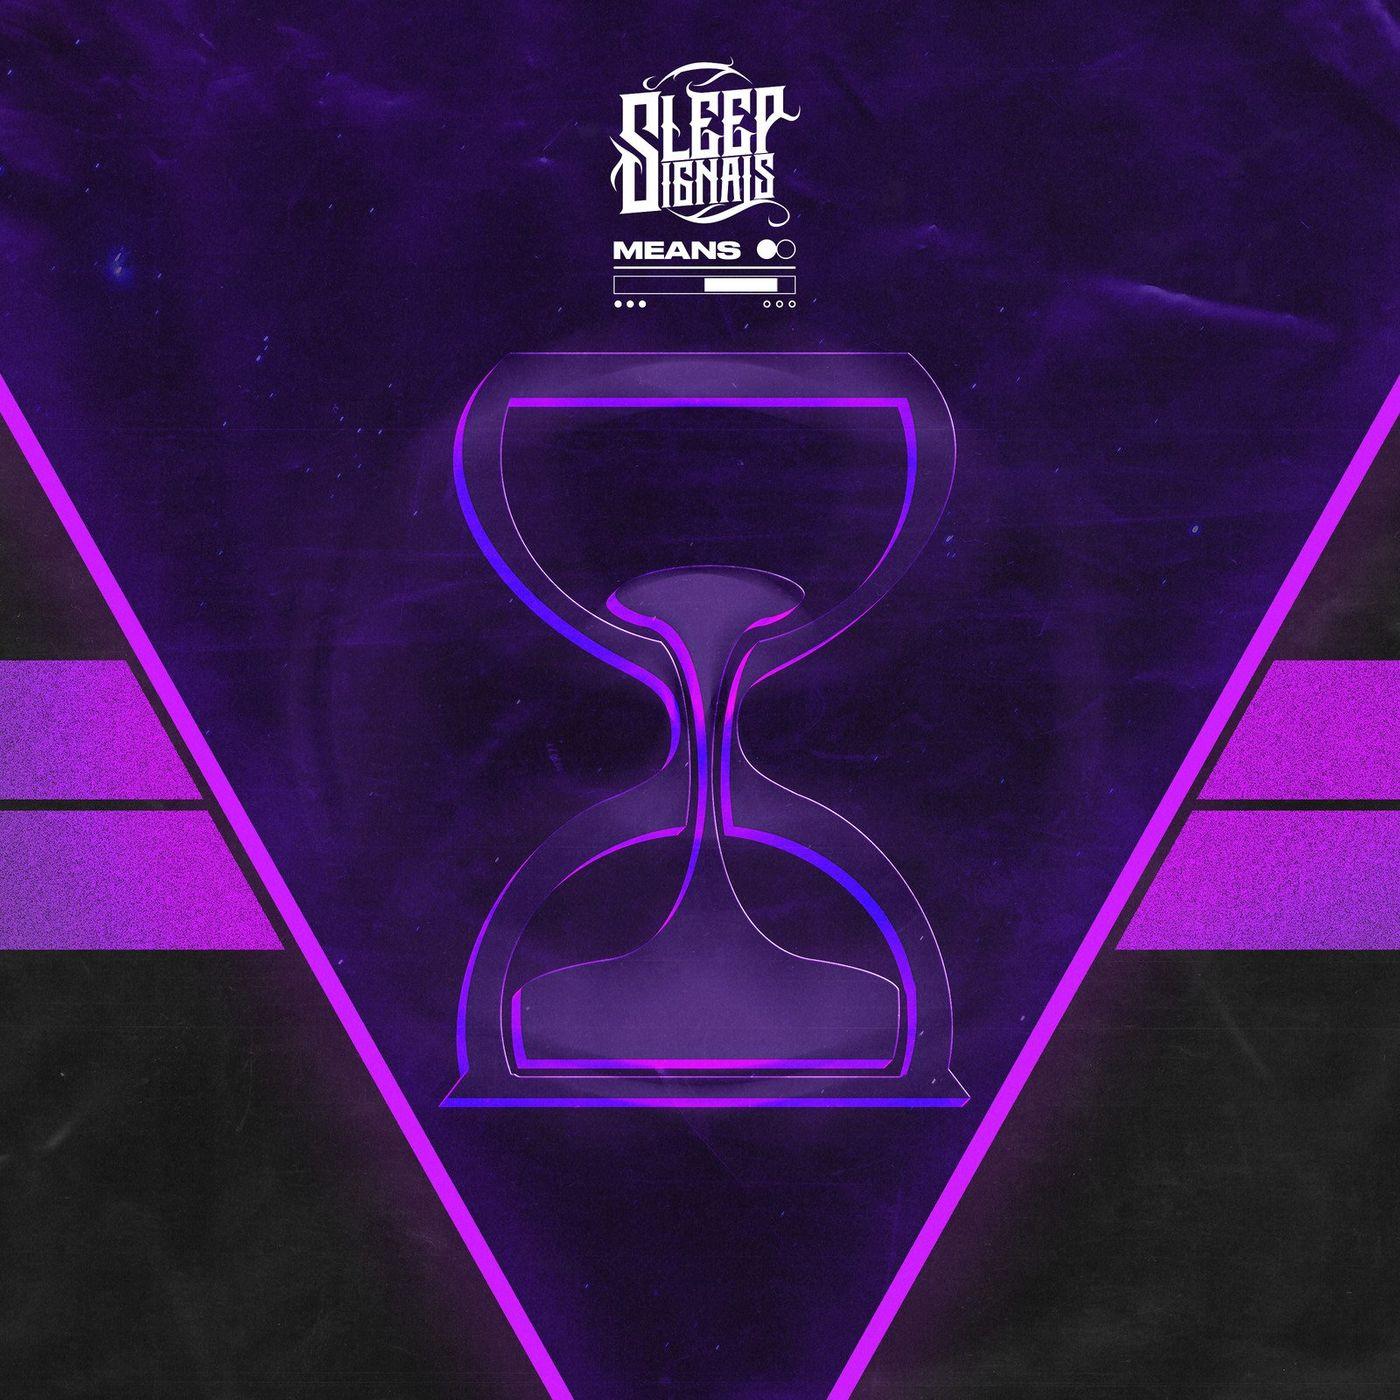 Sleep Signals - Means [single] (2021)